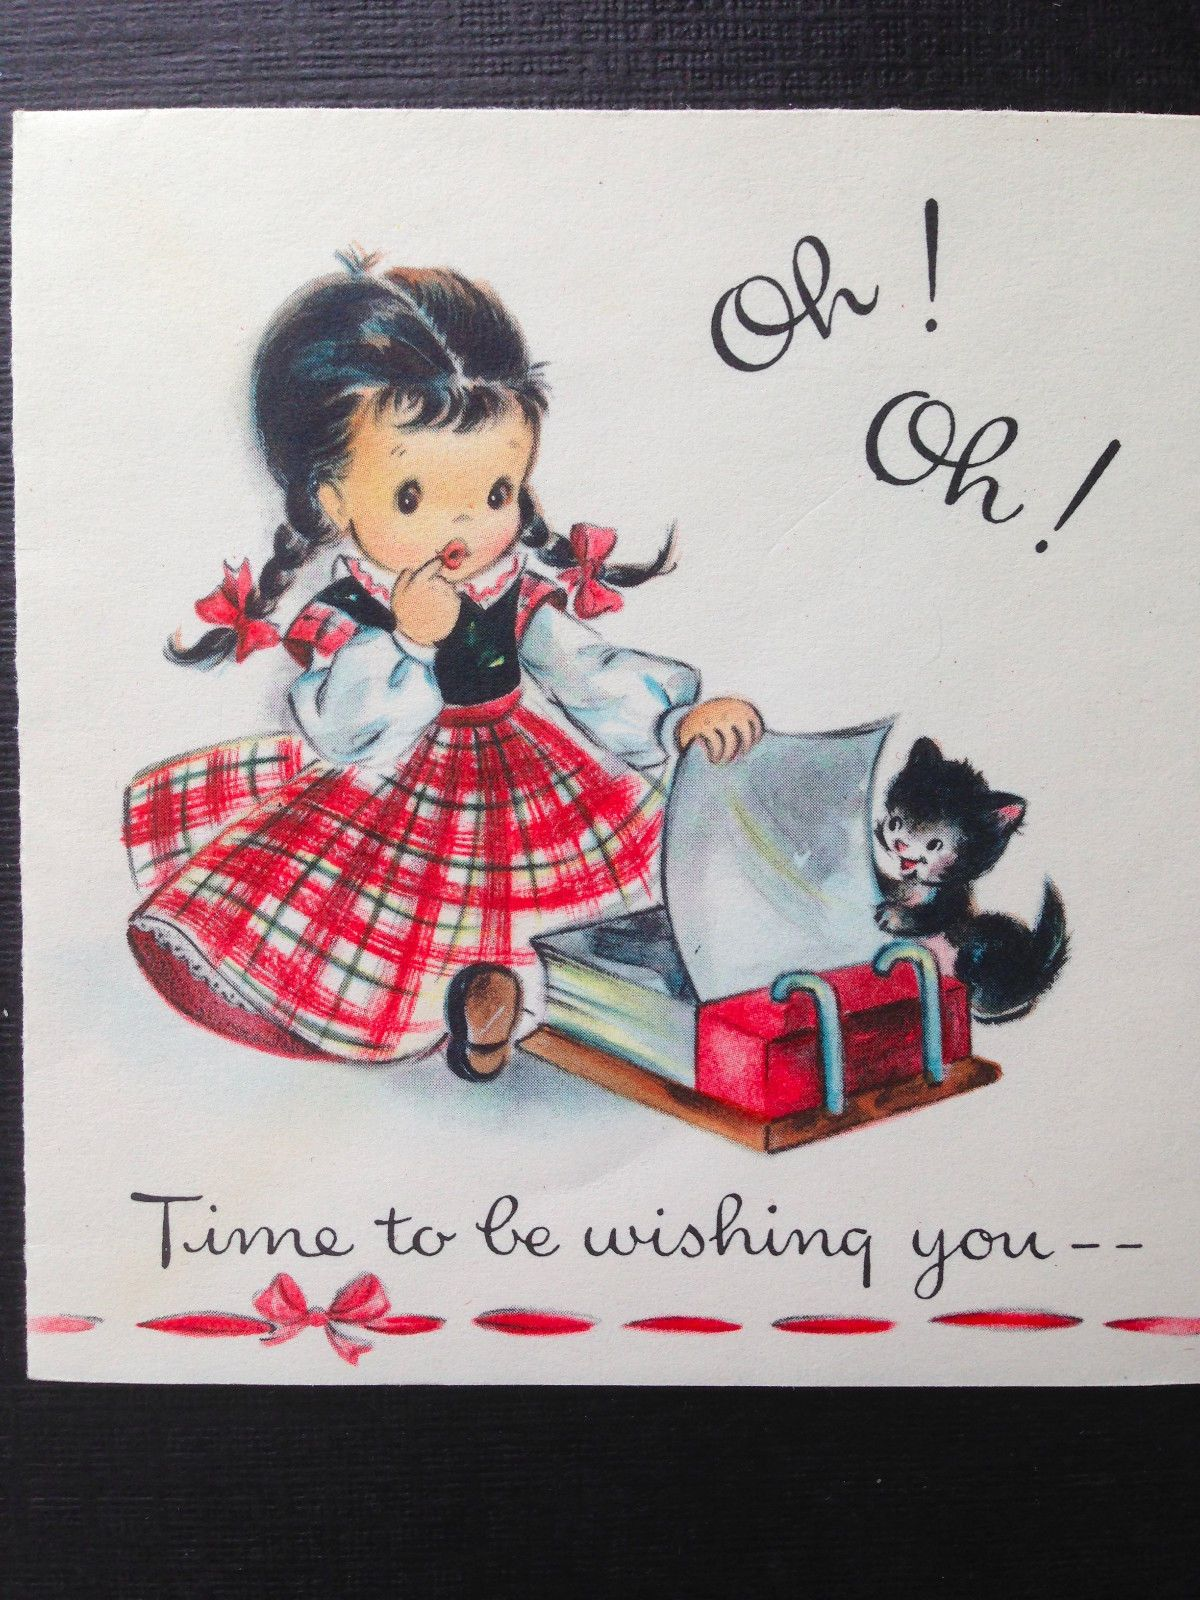 Vtg hallmark greeting cards lot 1950s birthday daughter mothers day vtg hallmark greeting cards lot 1950s birthday daughter mothers day pretty girls ebay bookmarktalkfo Image collections